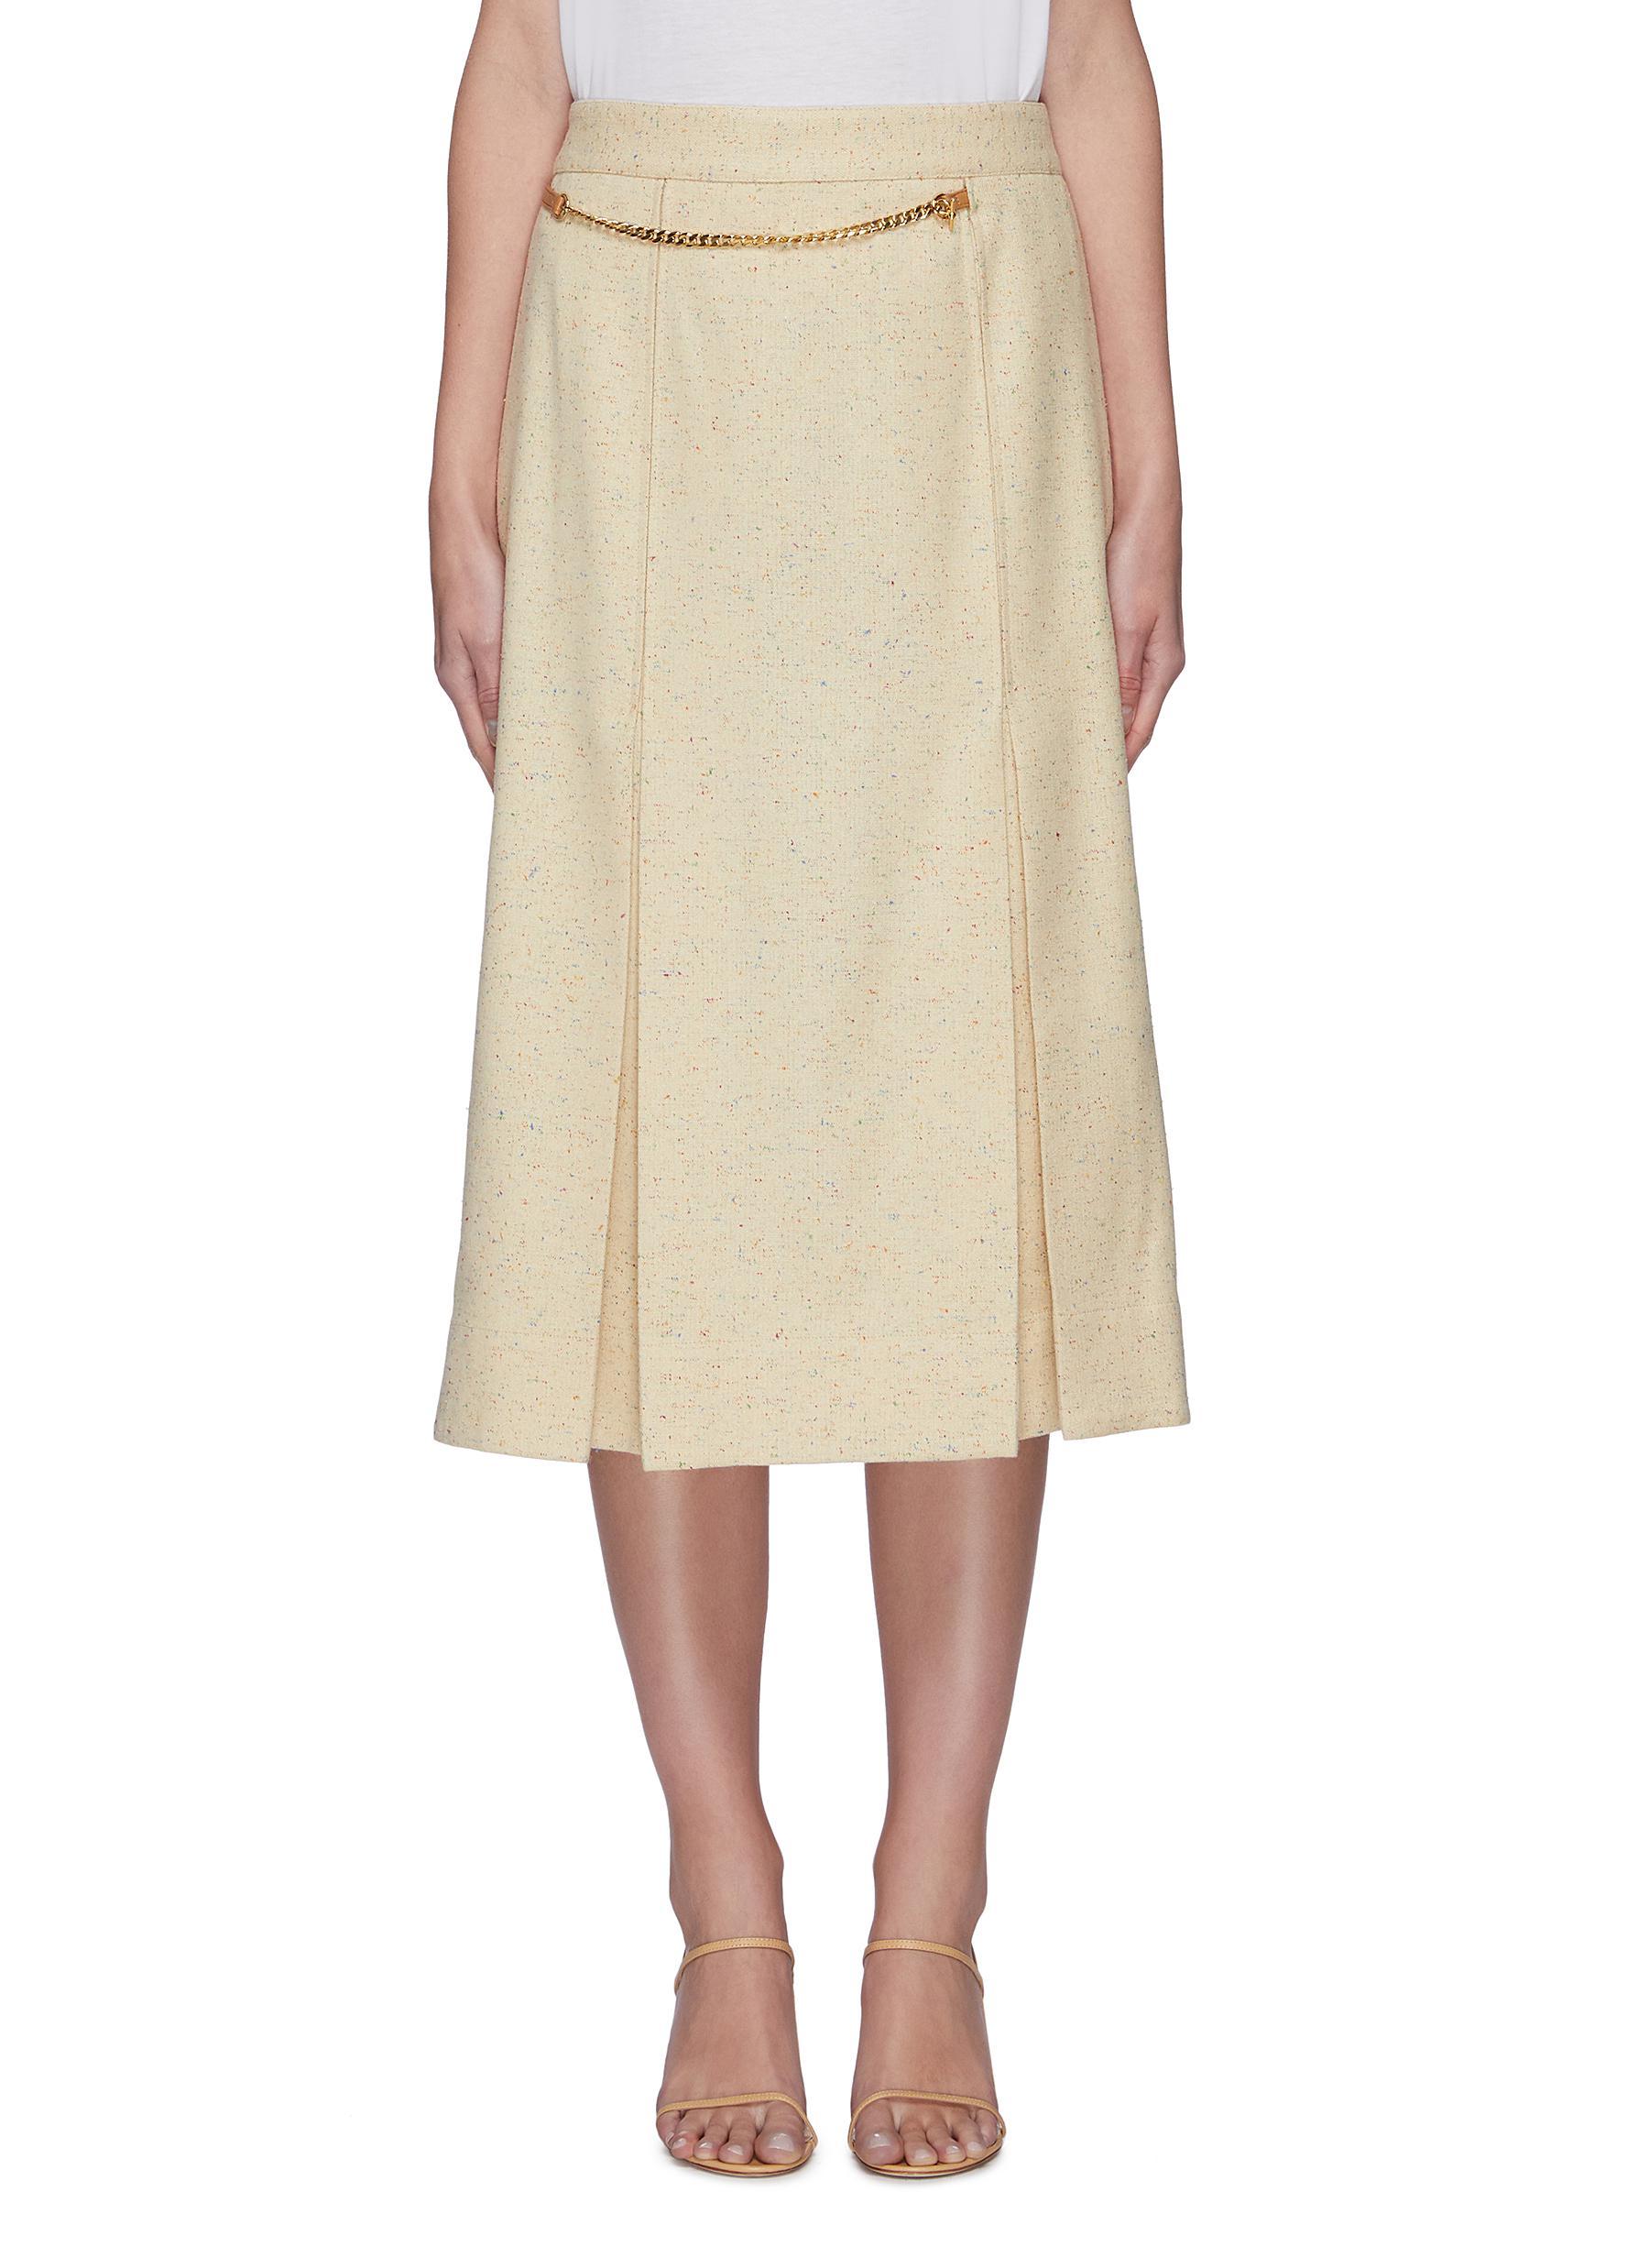 Buy Victoria Beckham Skirts Chain belt 70's skirt